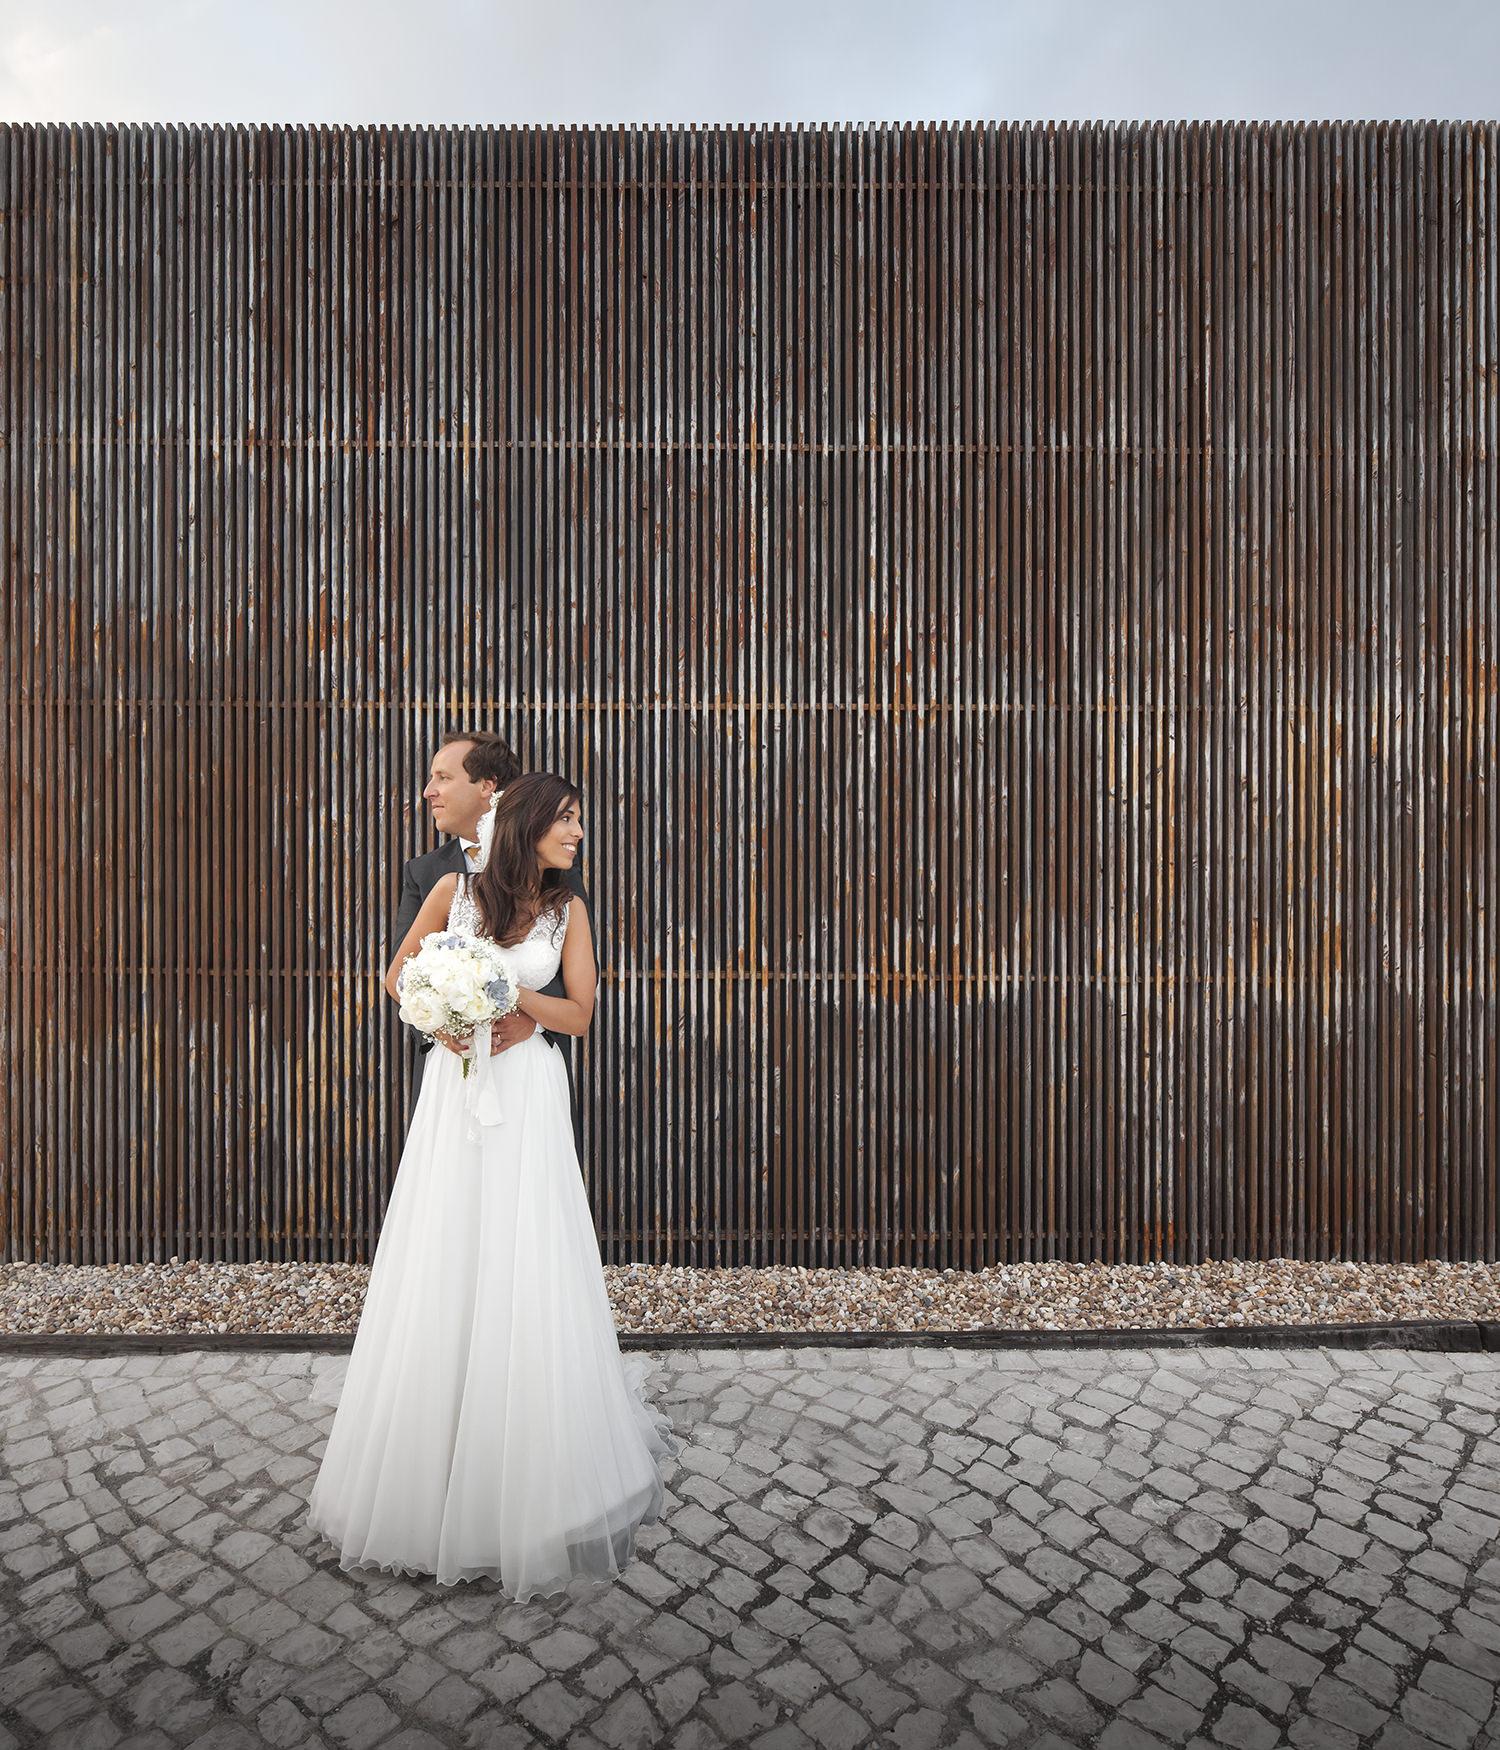 areias-seixo-wedding-photographer-terra-fotografia-151.jpg